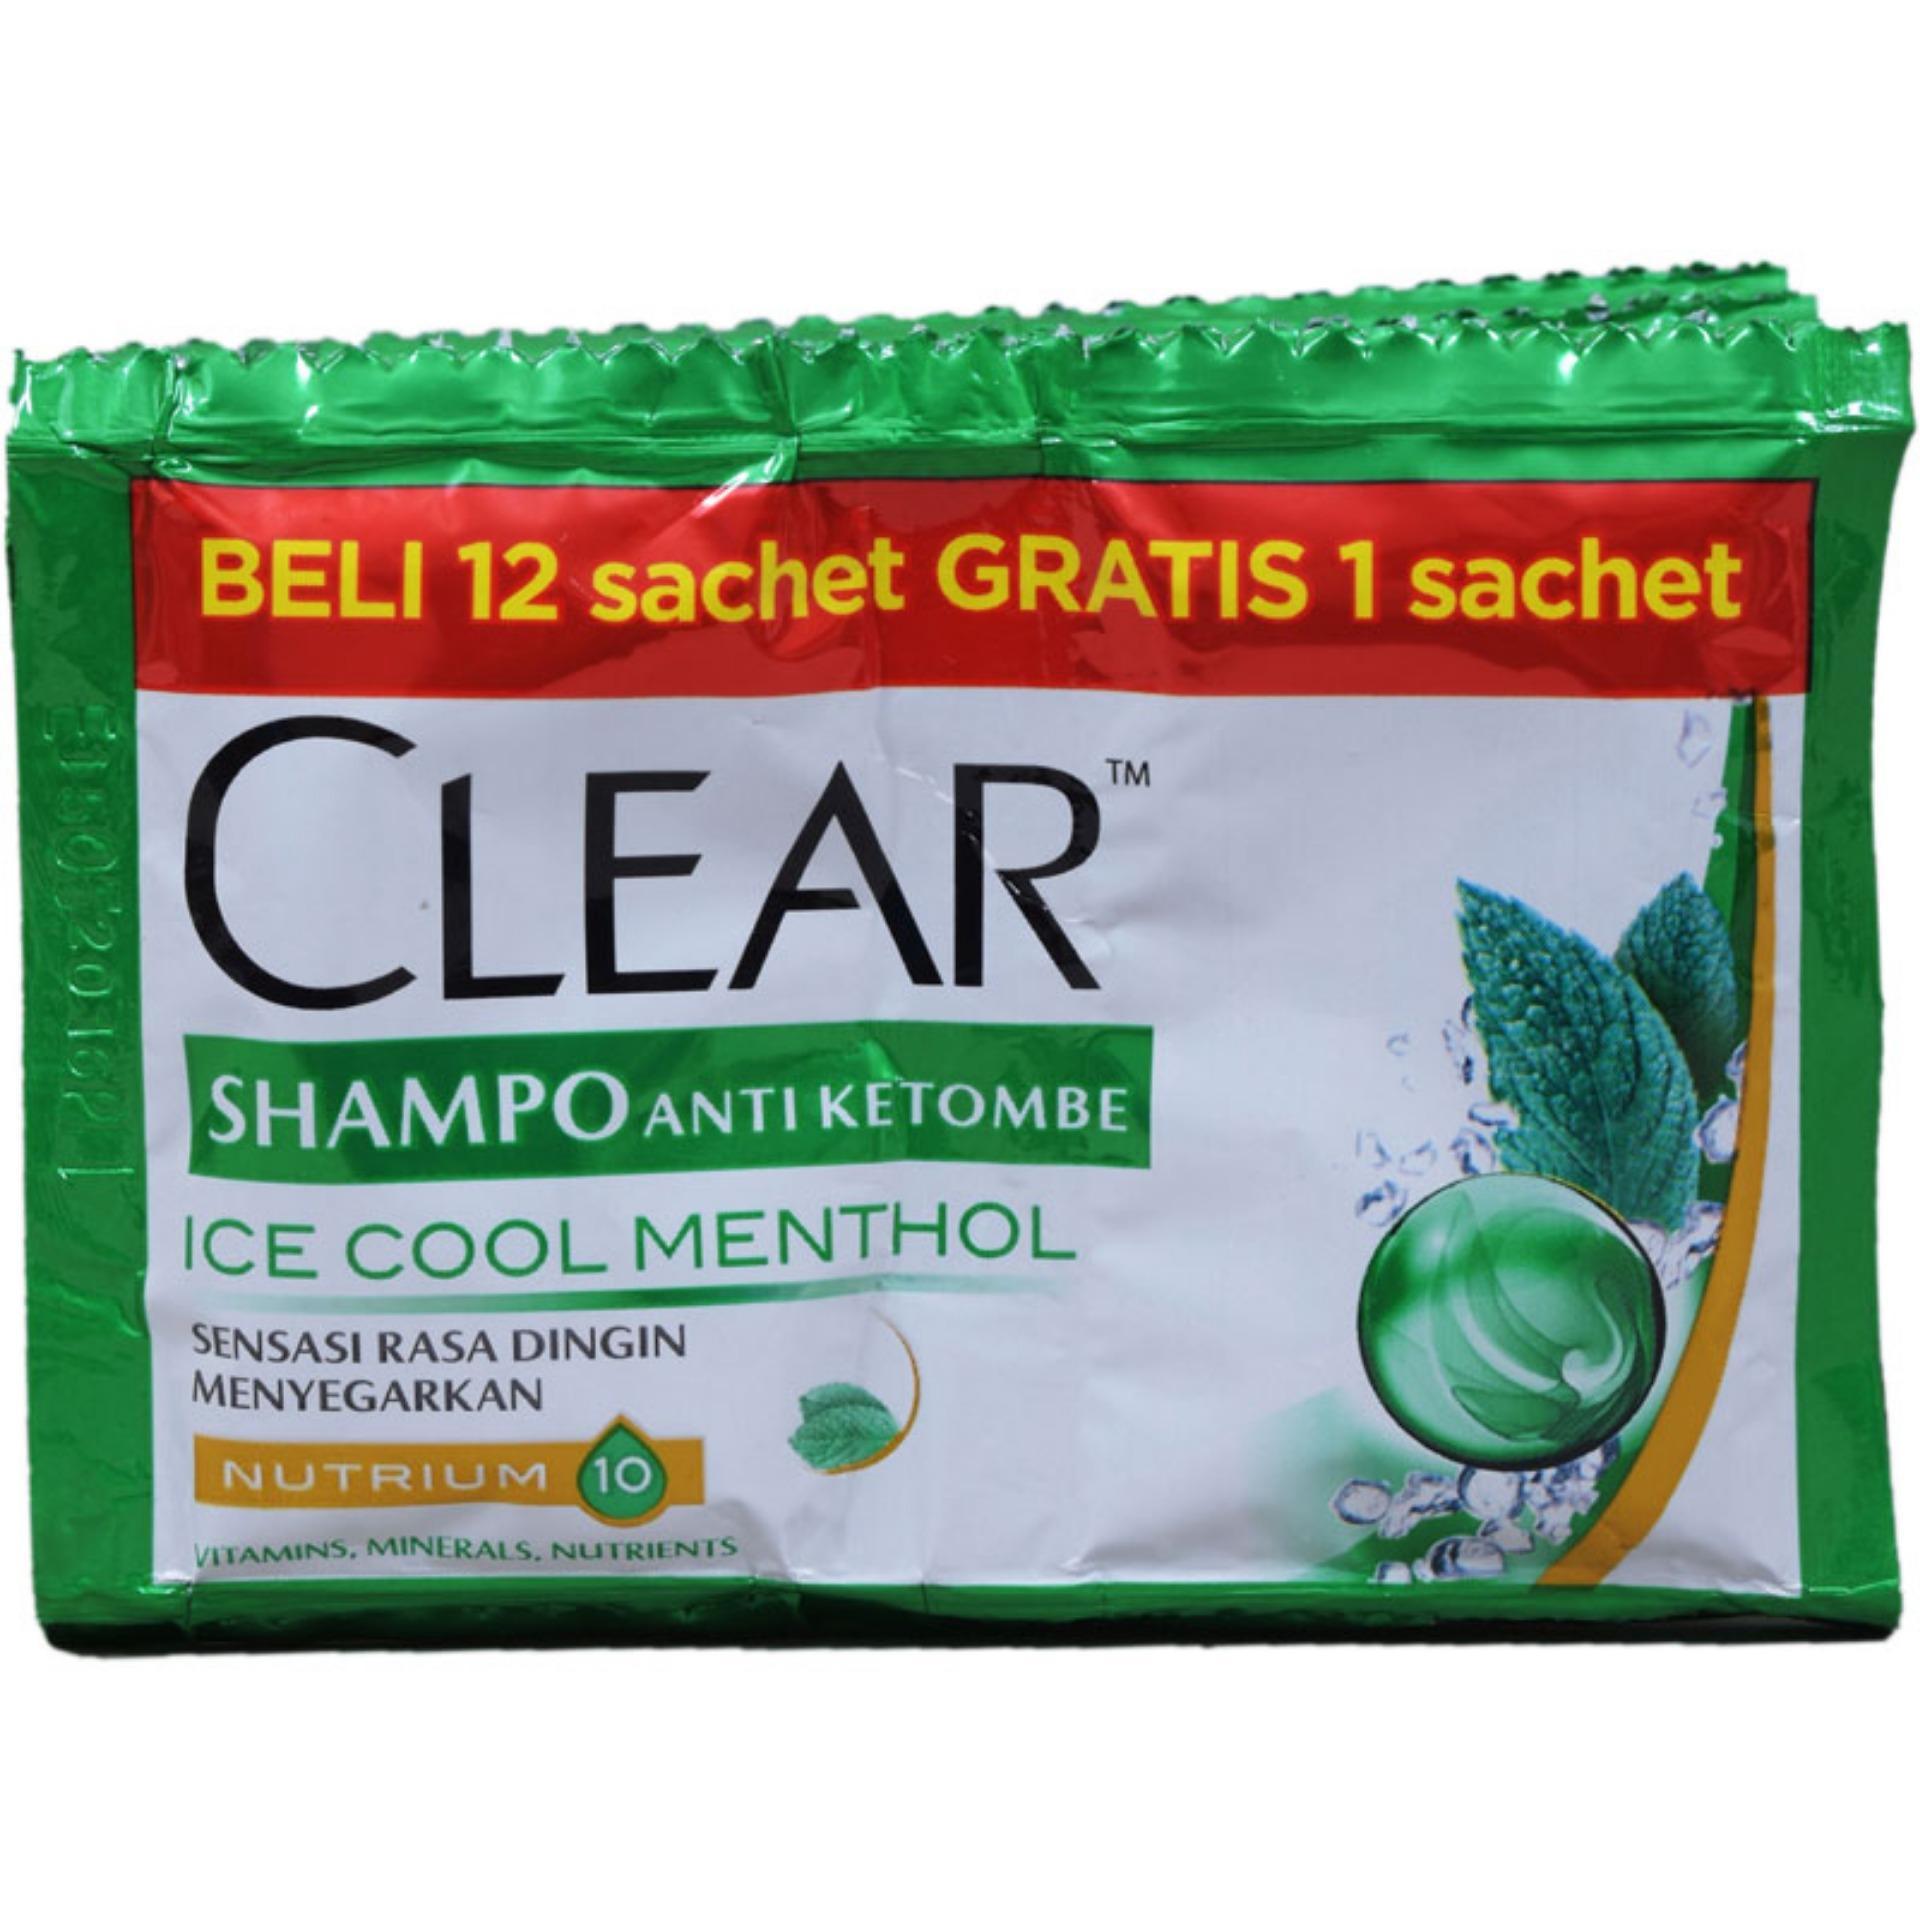 Fitur Clear Men Shampoo Anti Ketombe Ice Cool Menthol 170ml Dan Complete Soft Care 340 Ml 6x10